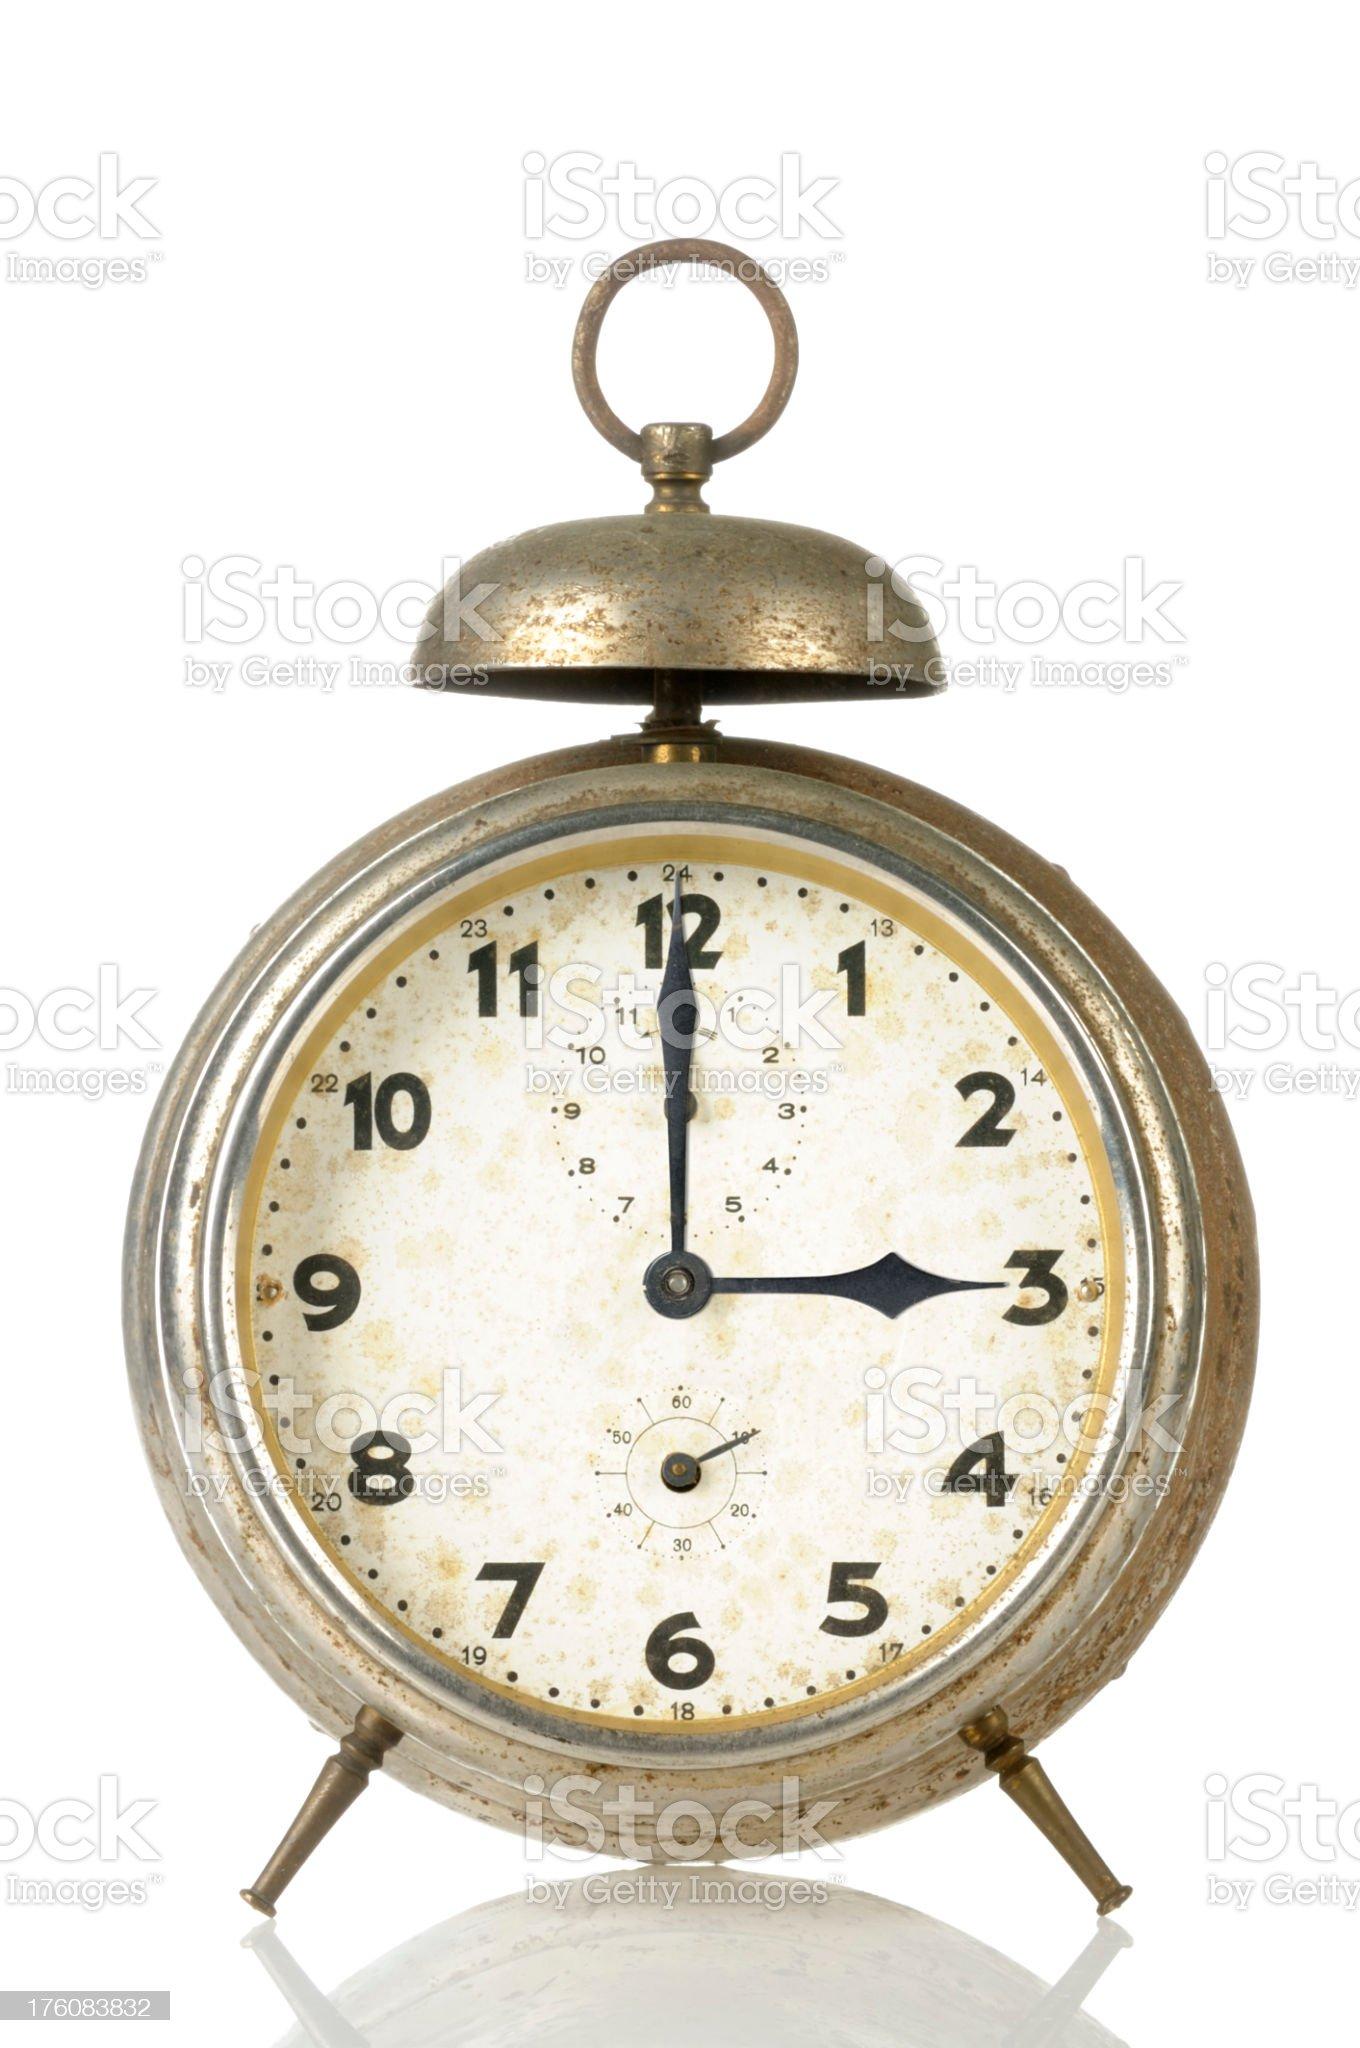 15 00 Old Alarm Clock royalty-free stock photo